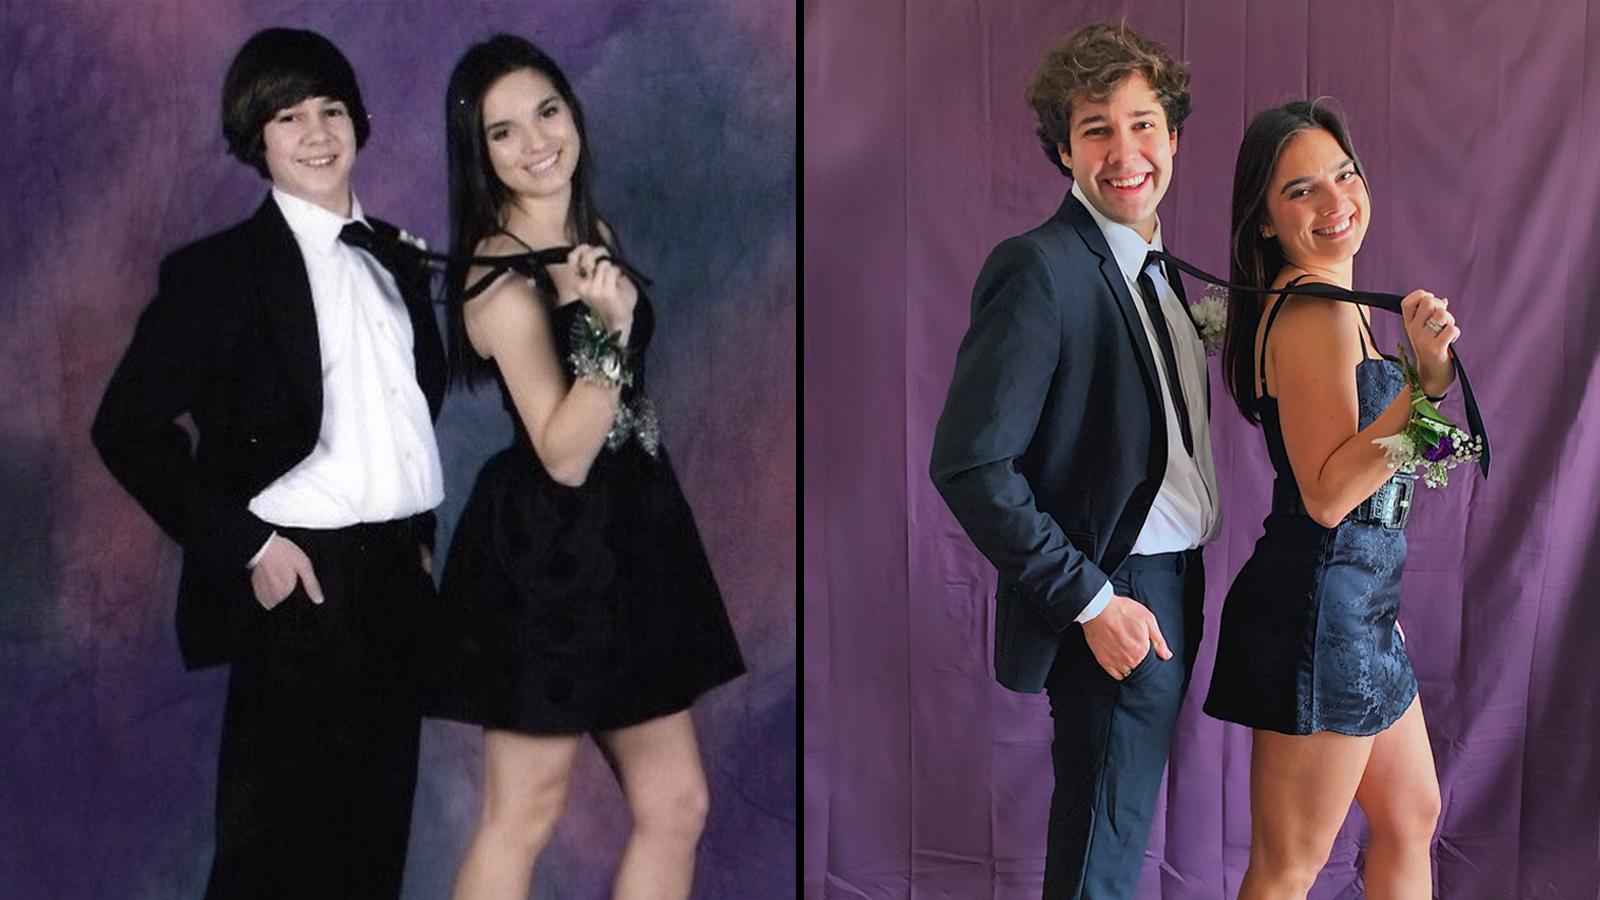 David Dobrik and Natalie Mariduena 9 years apart.